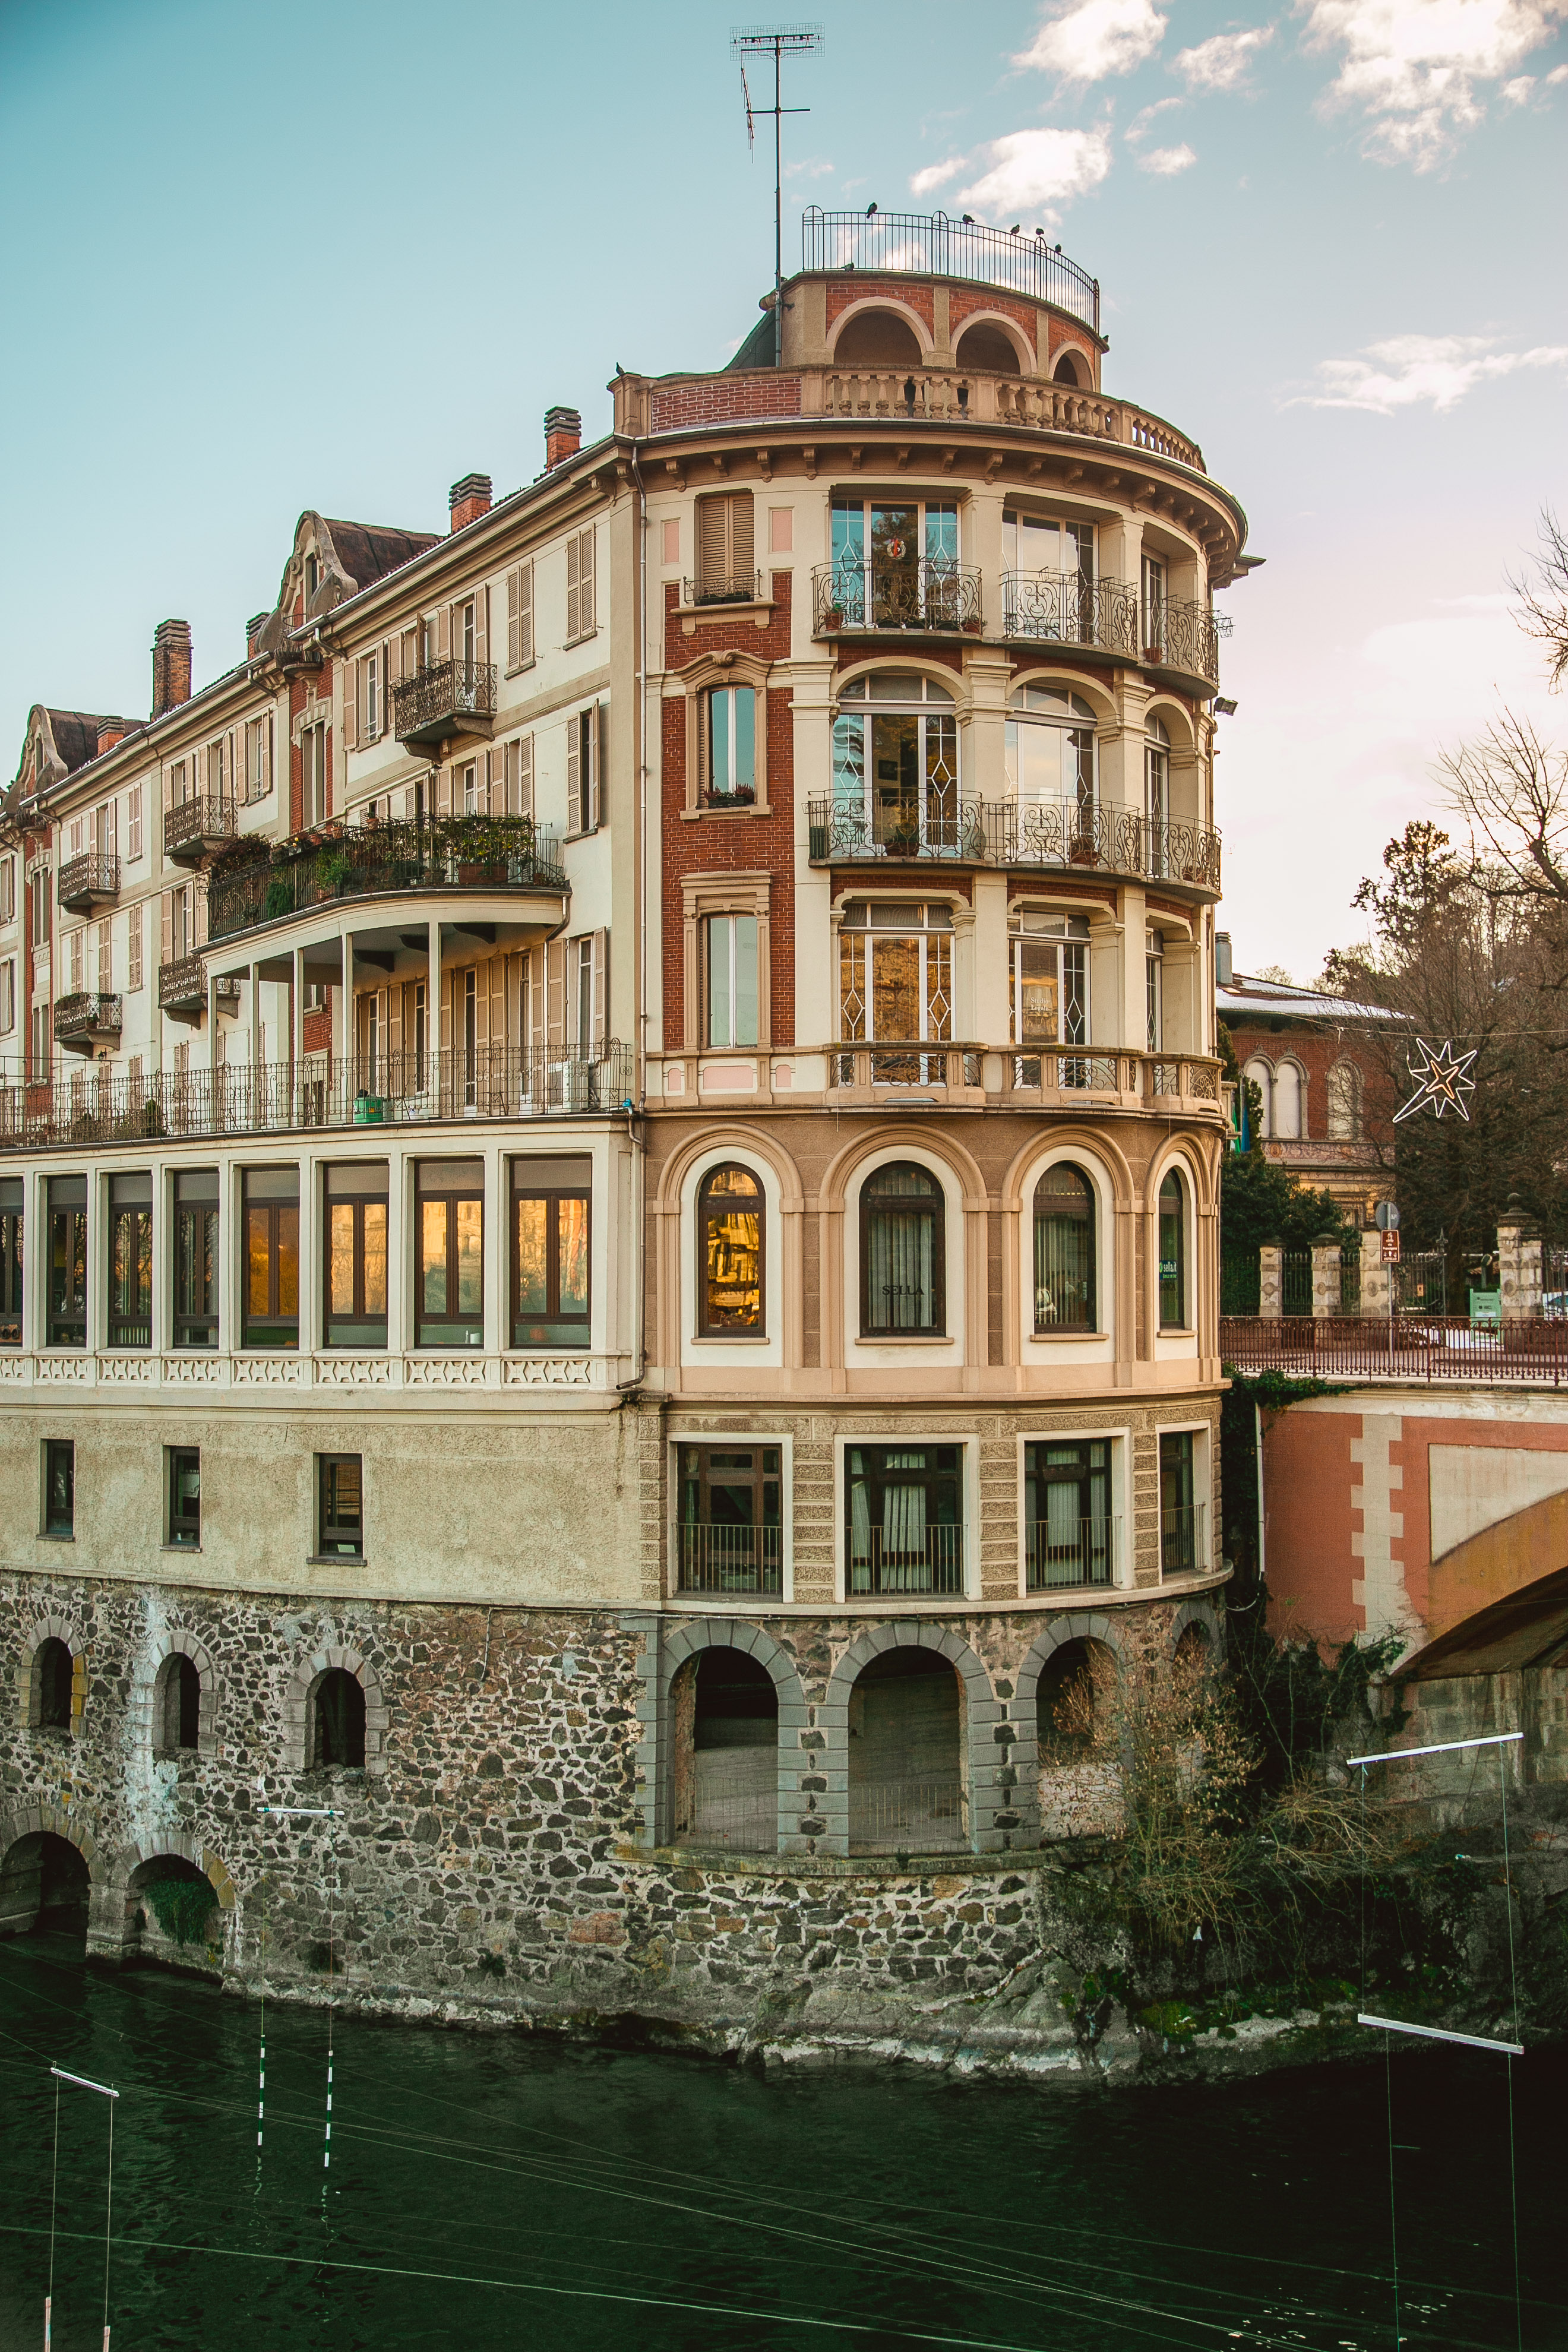 Piedmont Unveiled, the Manifesto | Thais FK on Due fili d'erba | #PiedmontUnveiled #PiemonteSvelato | Lonely Planet Best in Travel | Piemonte Top Region 2019